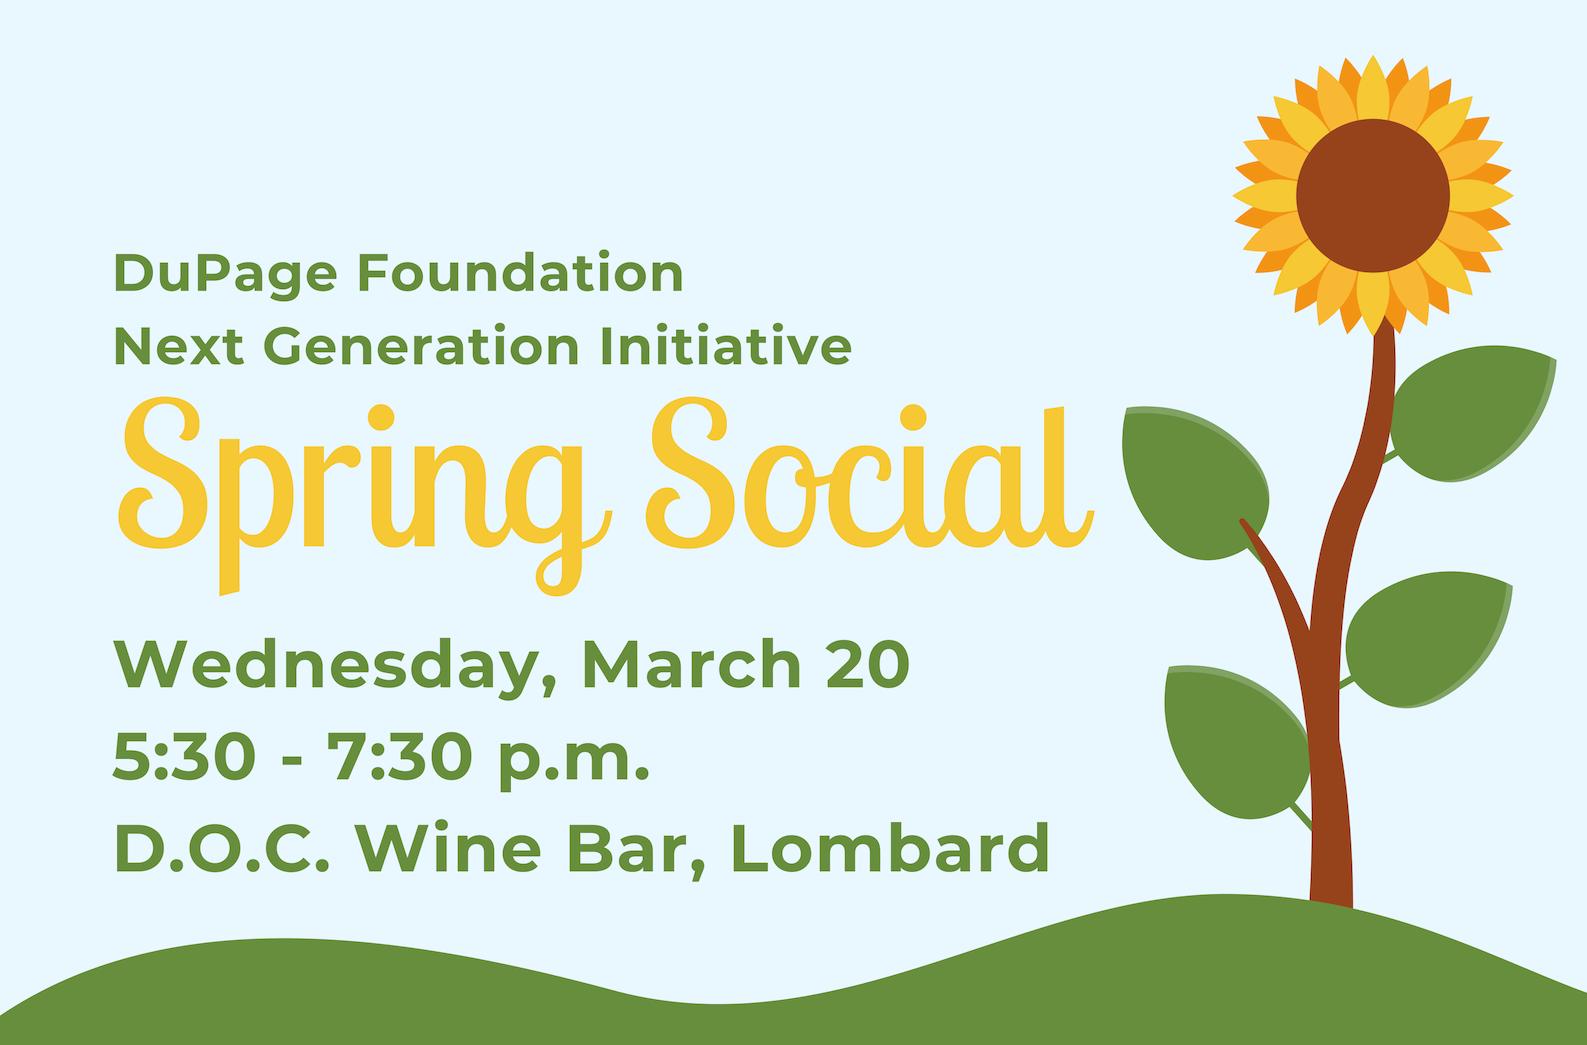 NGI Spring Social: REGISTRATION IS CLOSED